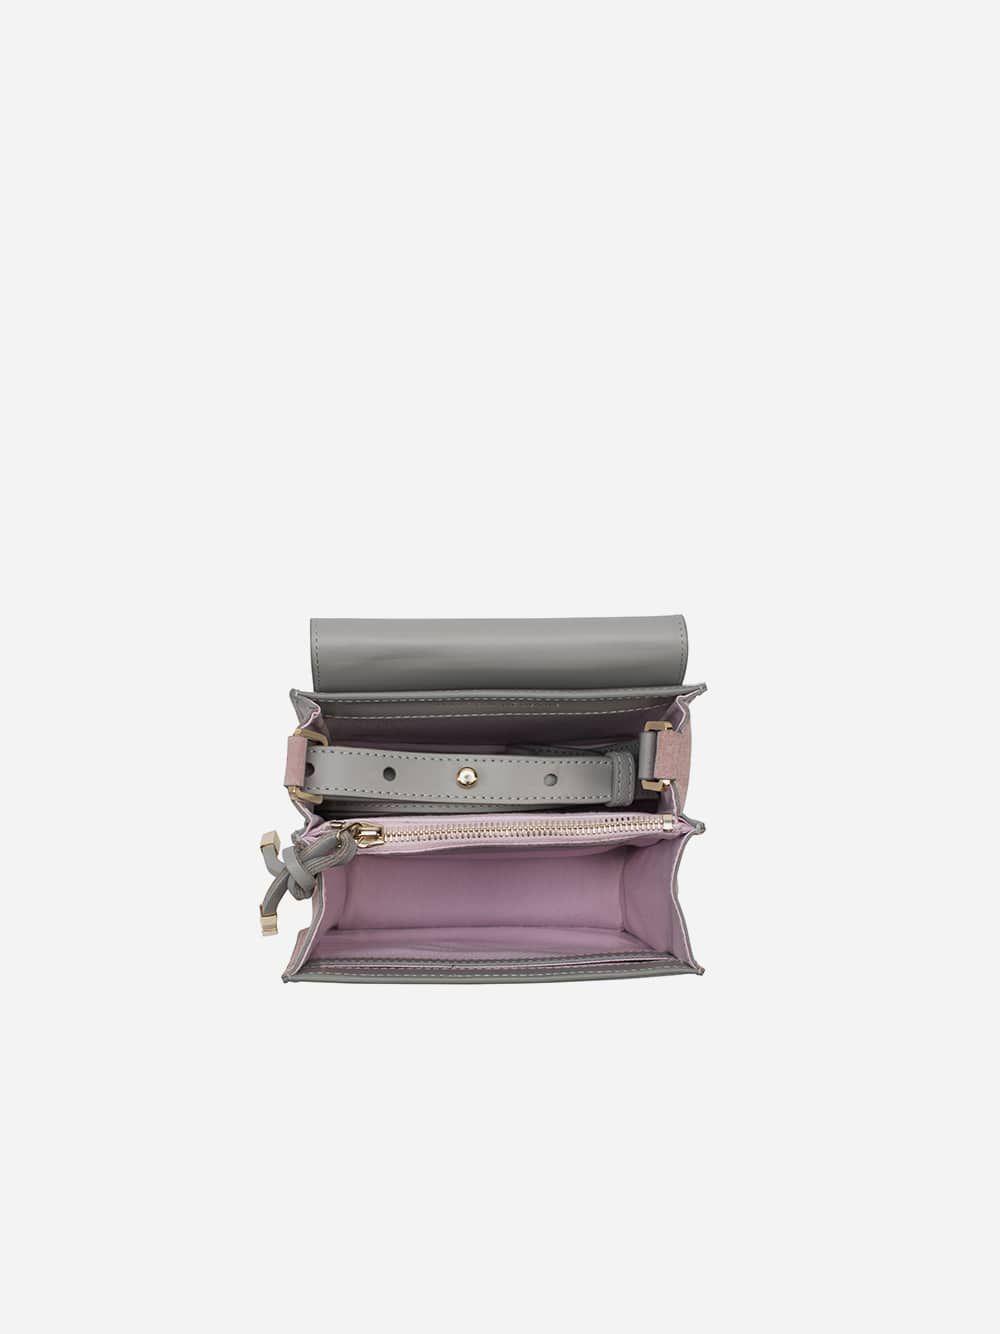 Tilda Grey Crossbody Smartphone | Maison Héroïne